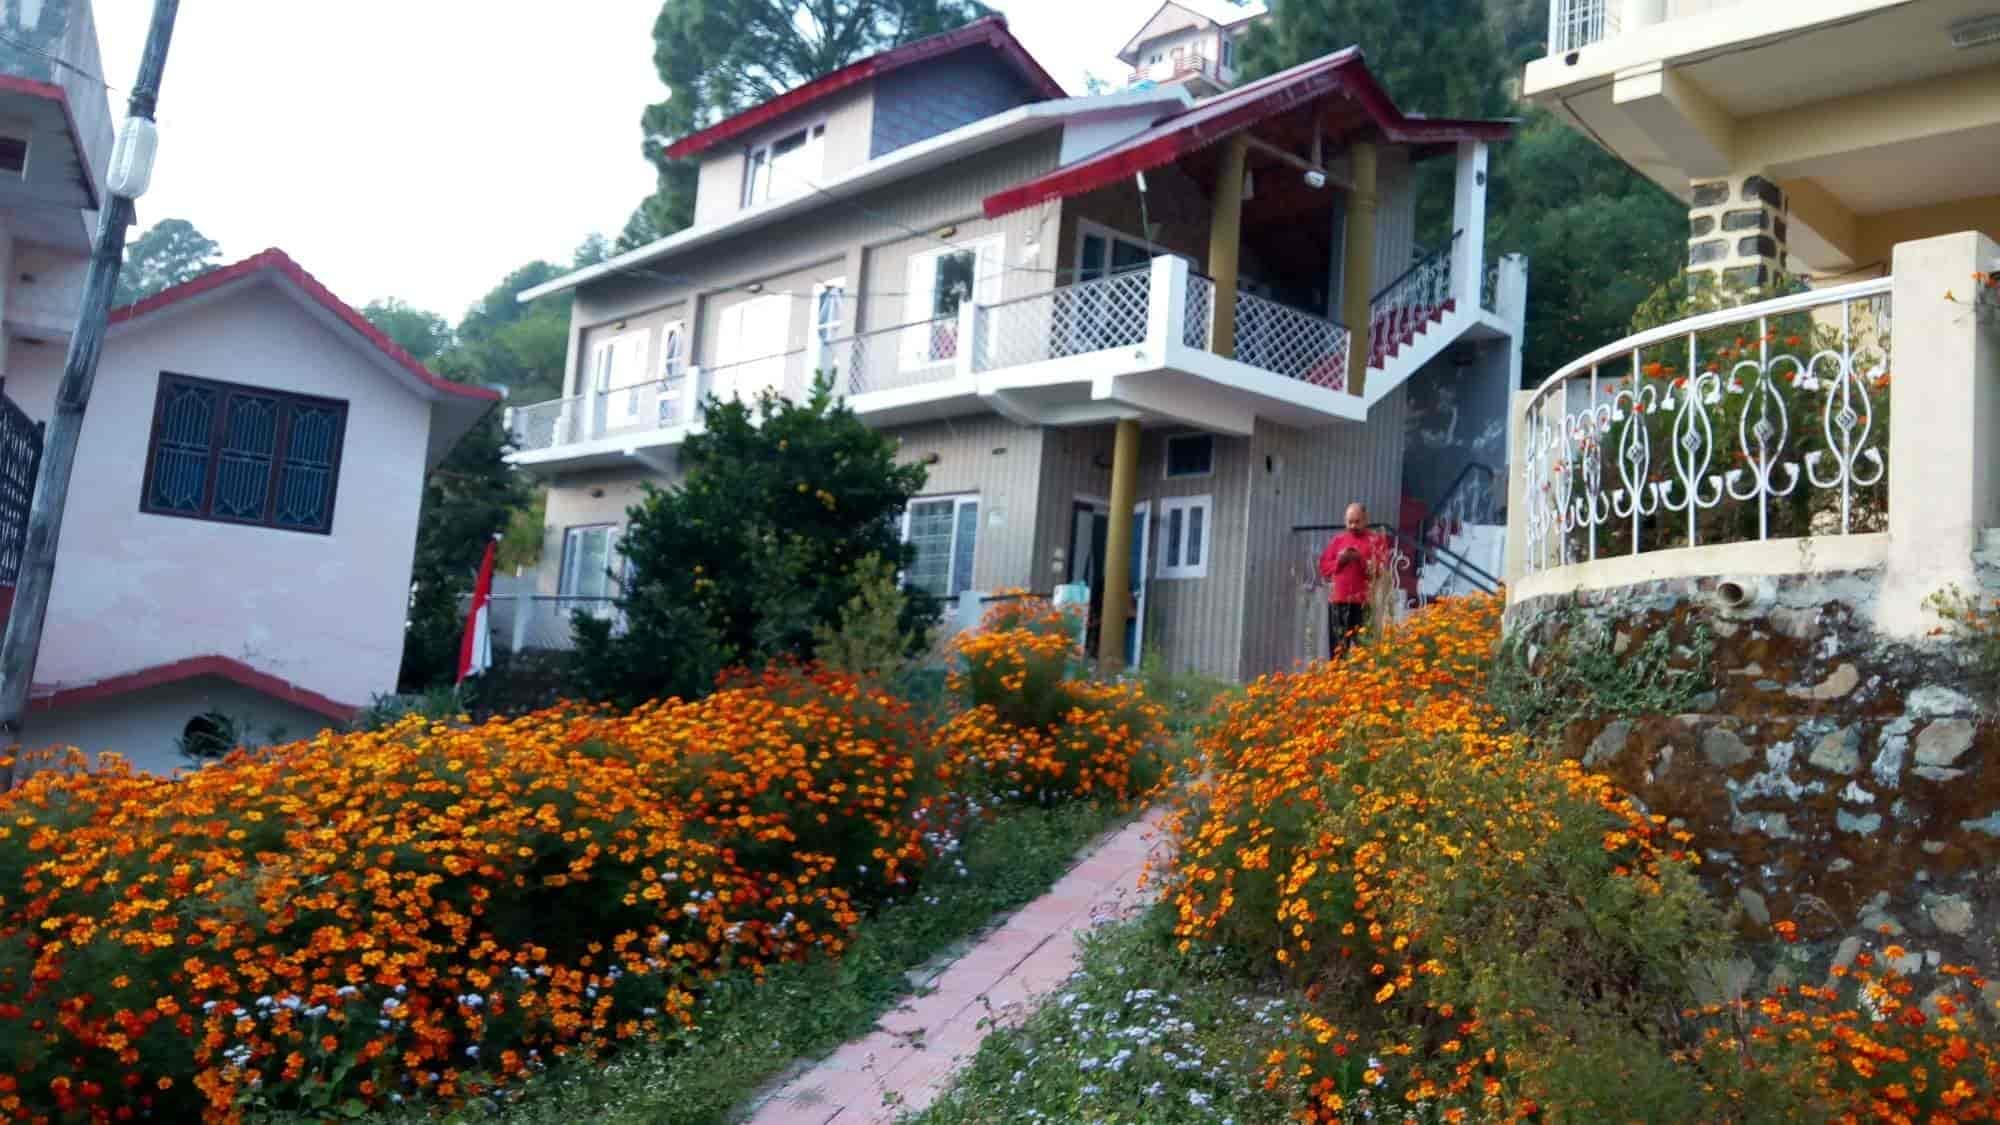 R K Lake View Inn Bhimtal Hotels In Nainital Justdial